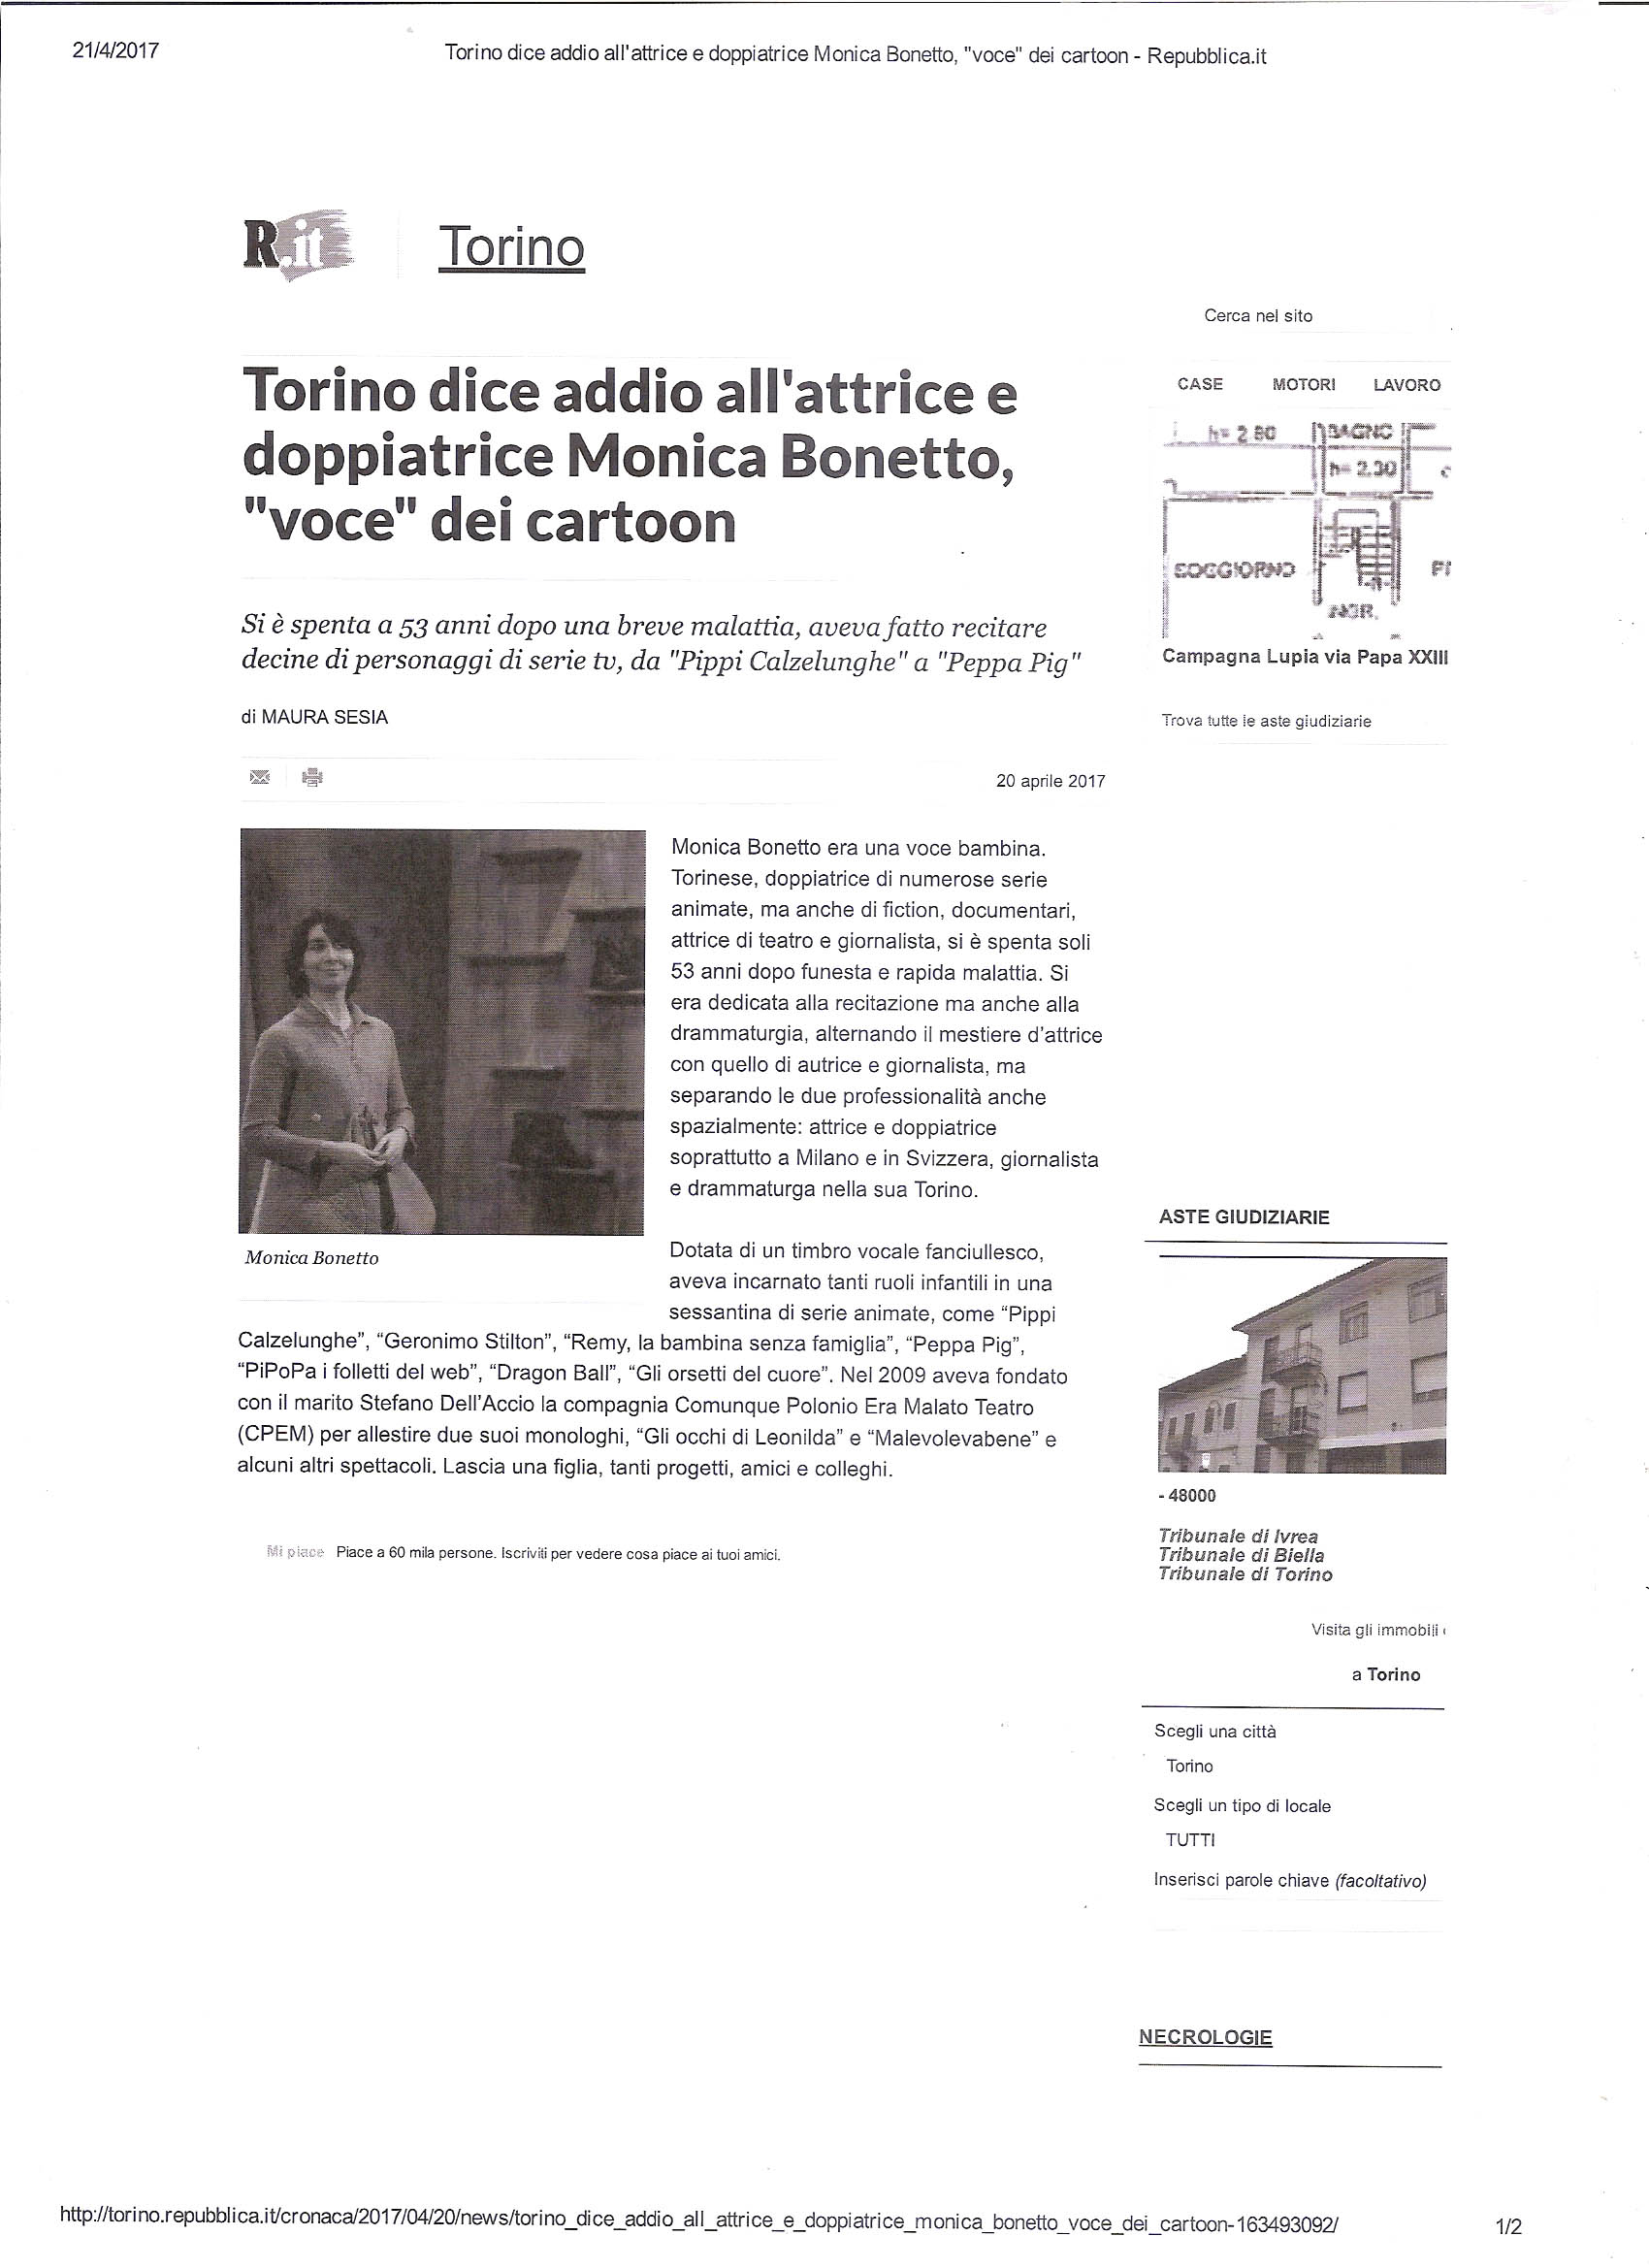 monica bonetto_1